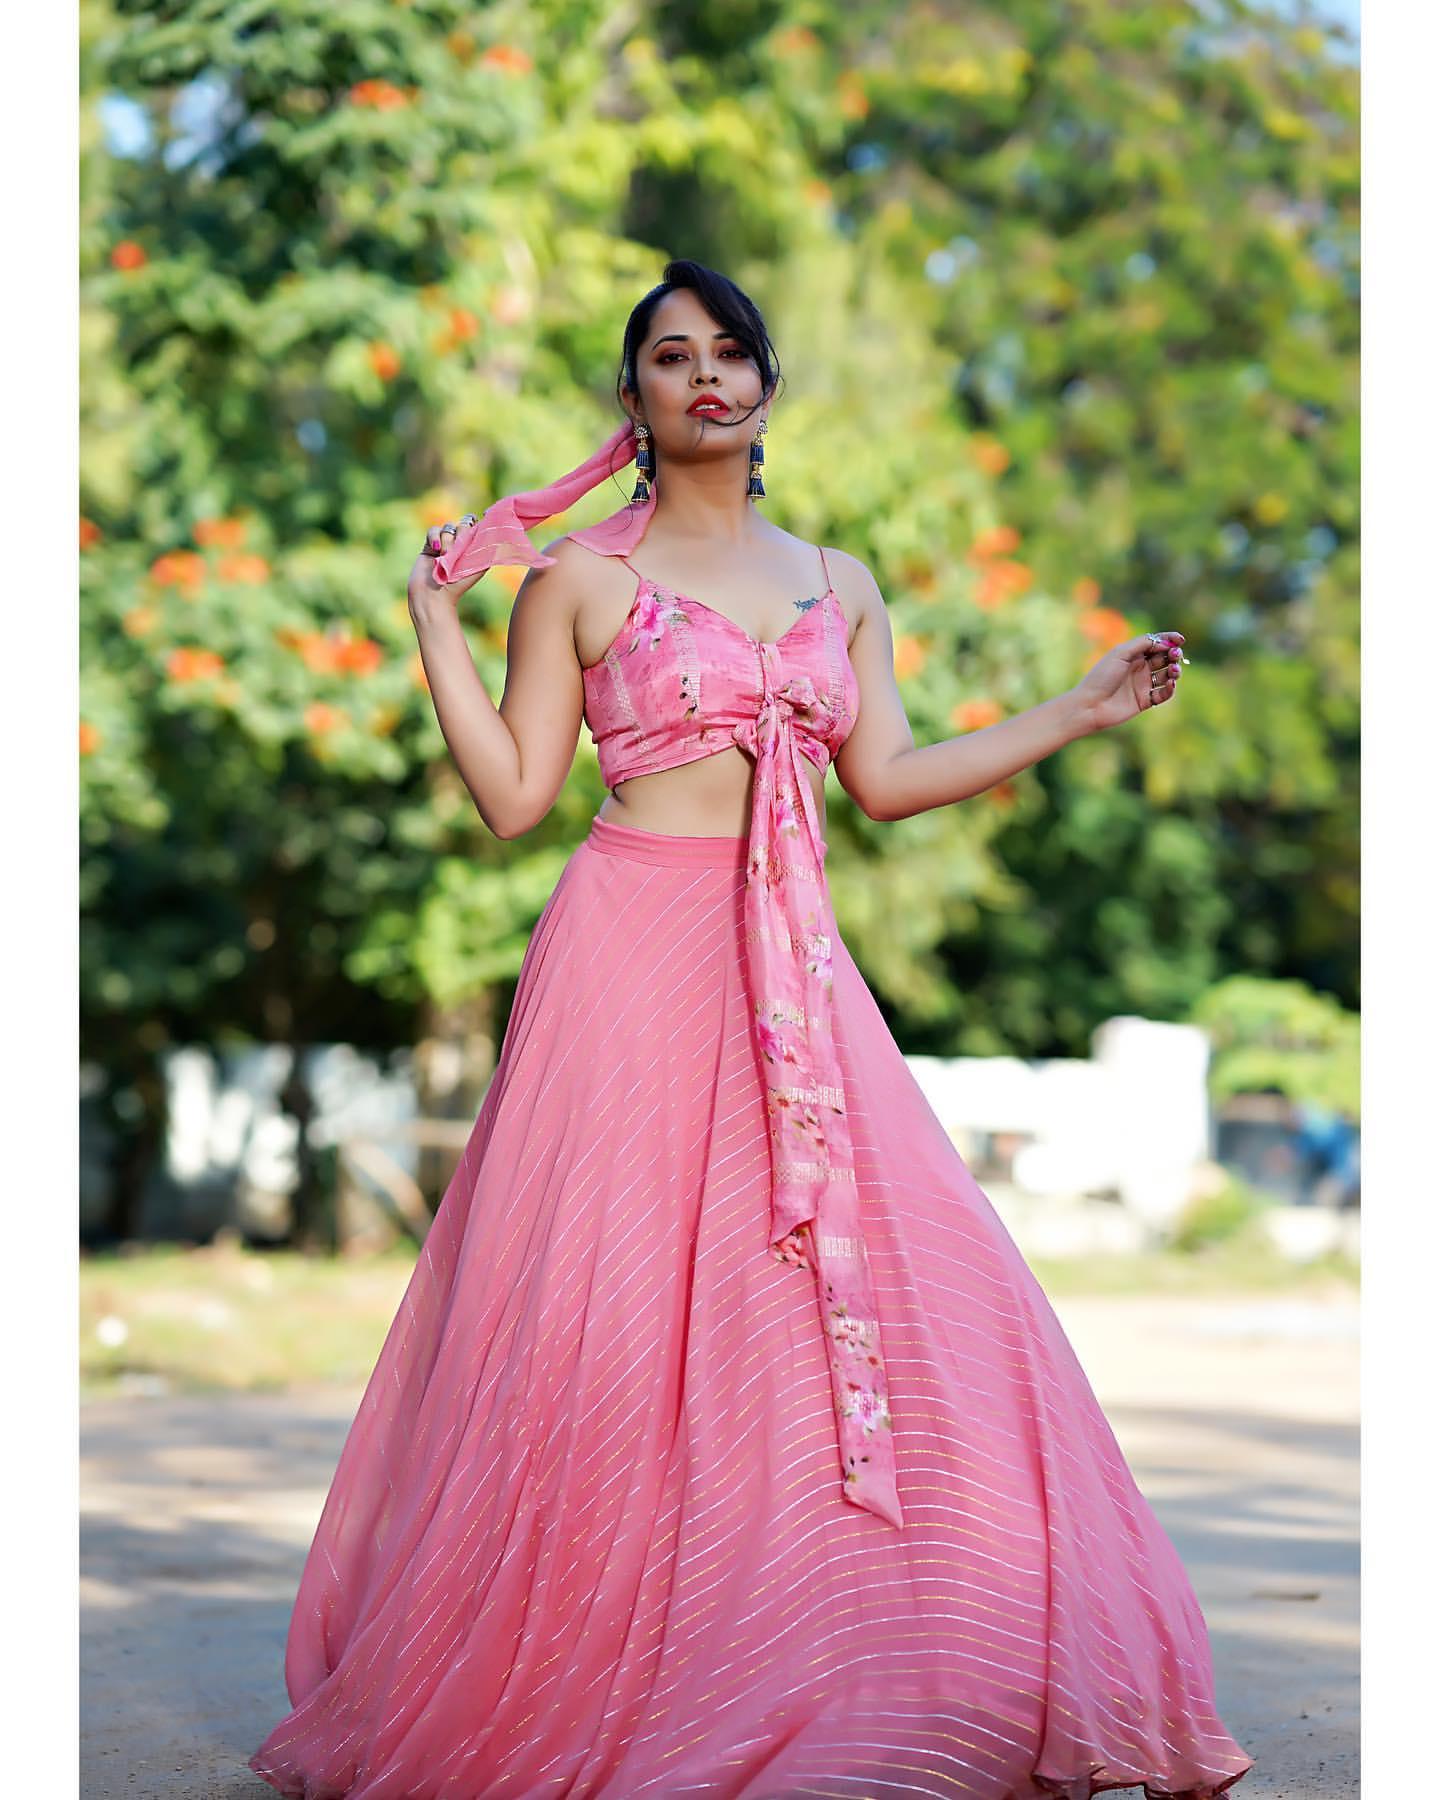 Anchor Anasuya : కేకపెట్టించిన అనసూయ.. జబర్దస్త్ భామ అందాలకు ఆహా అనాల్సిందే... Photo : Instagram